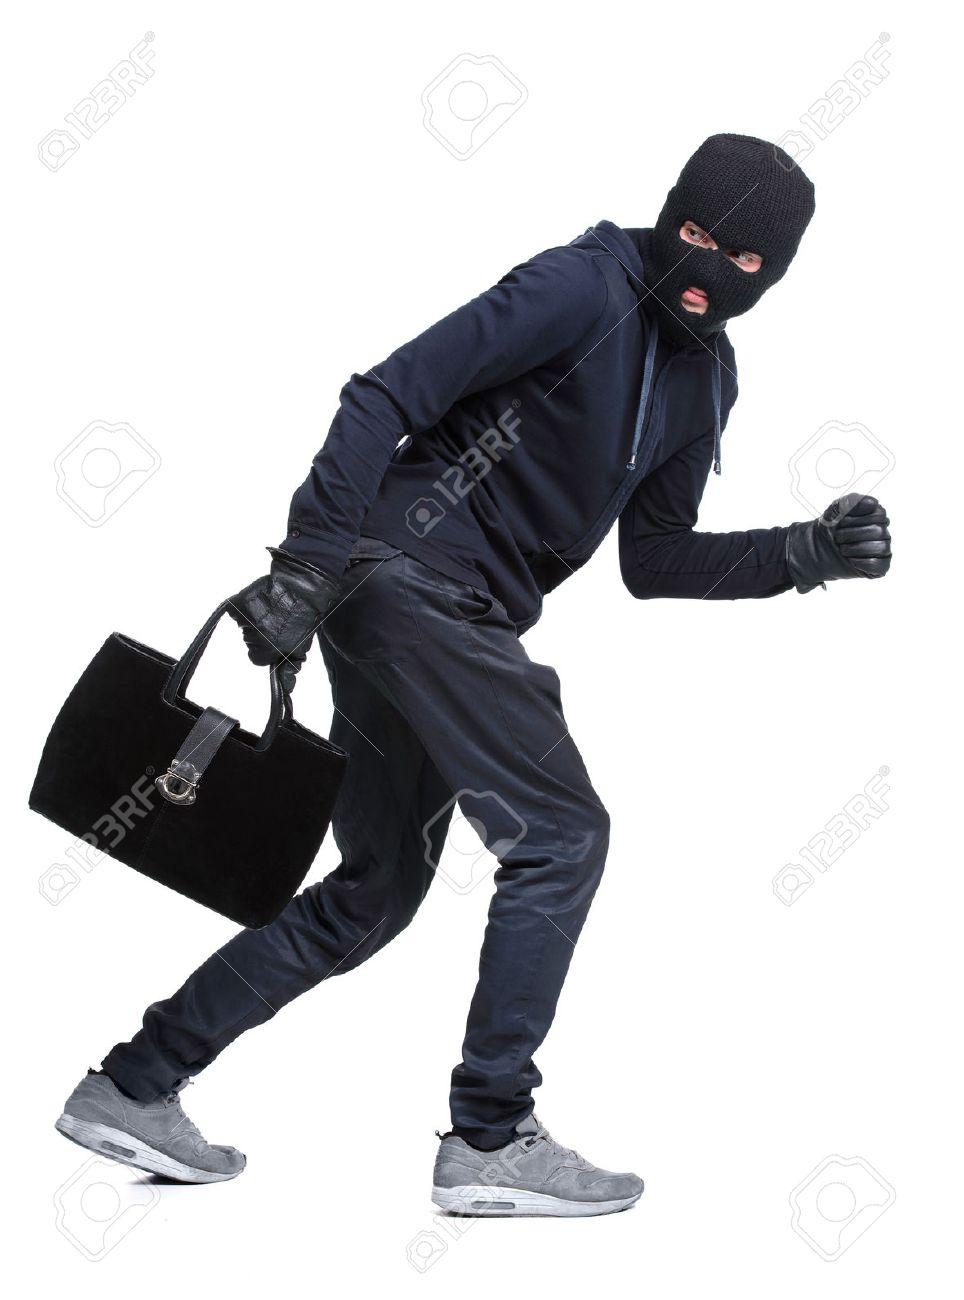 Portrait of running male burglar with a handbag. Isolated on white background Stock Photo - 28277601